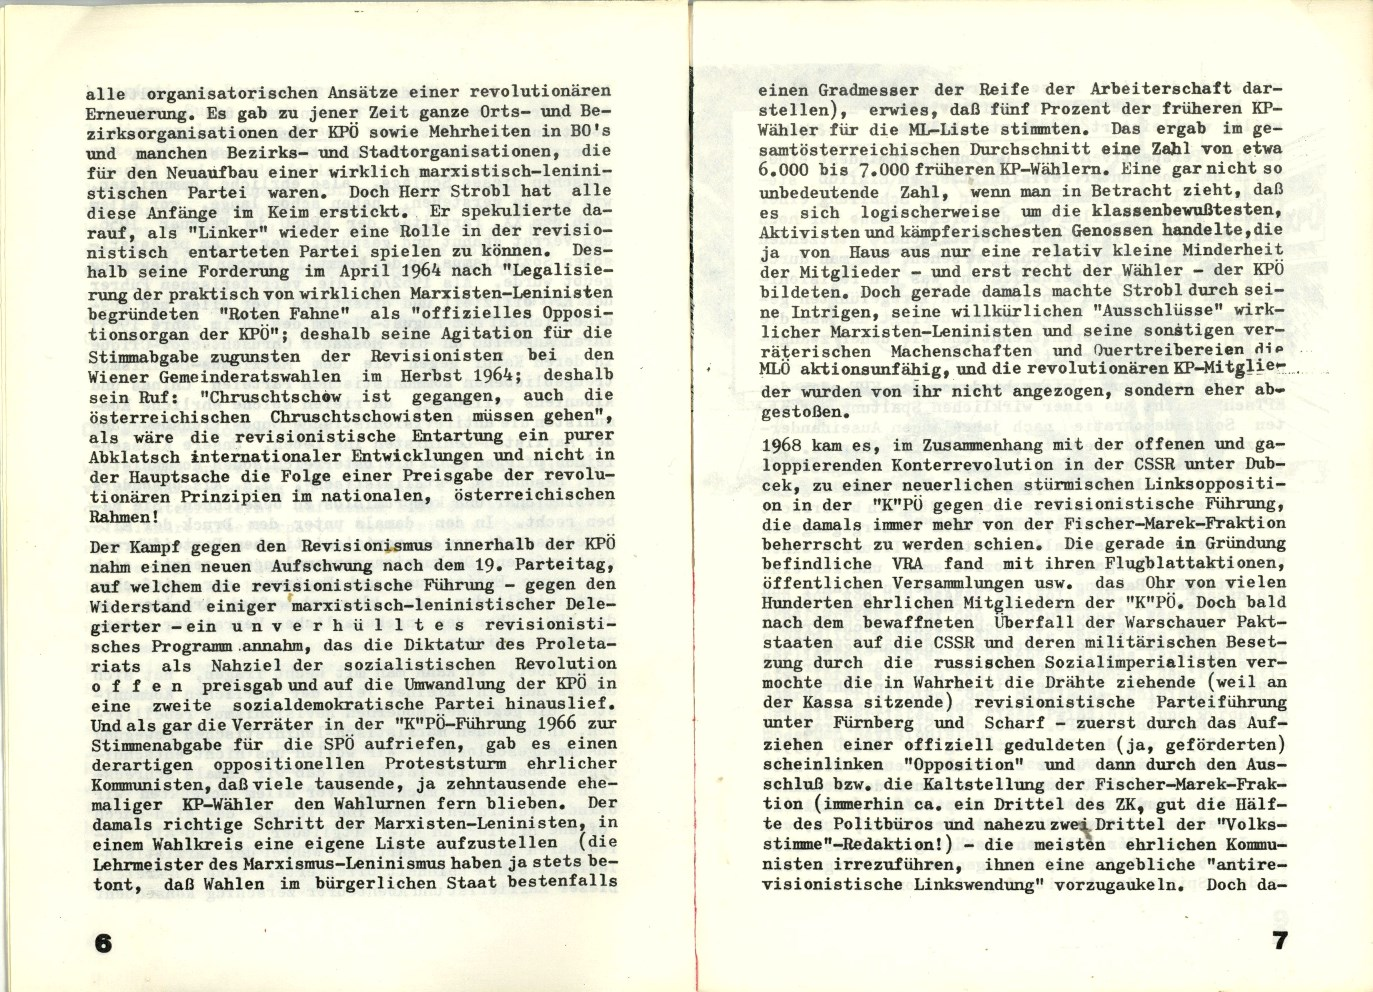 VRA_Perspektiven_1975_05